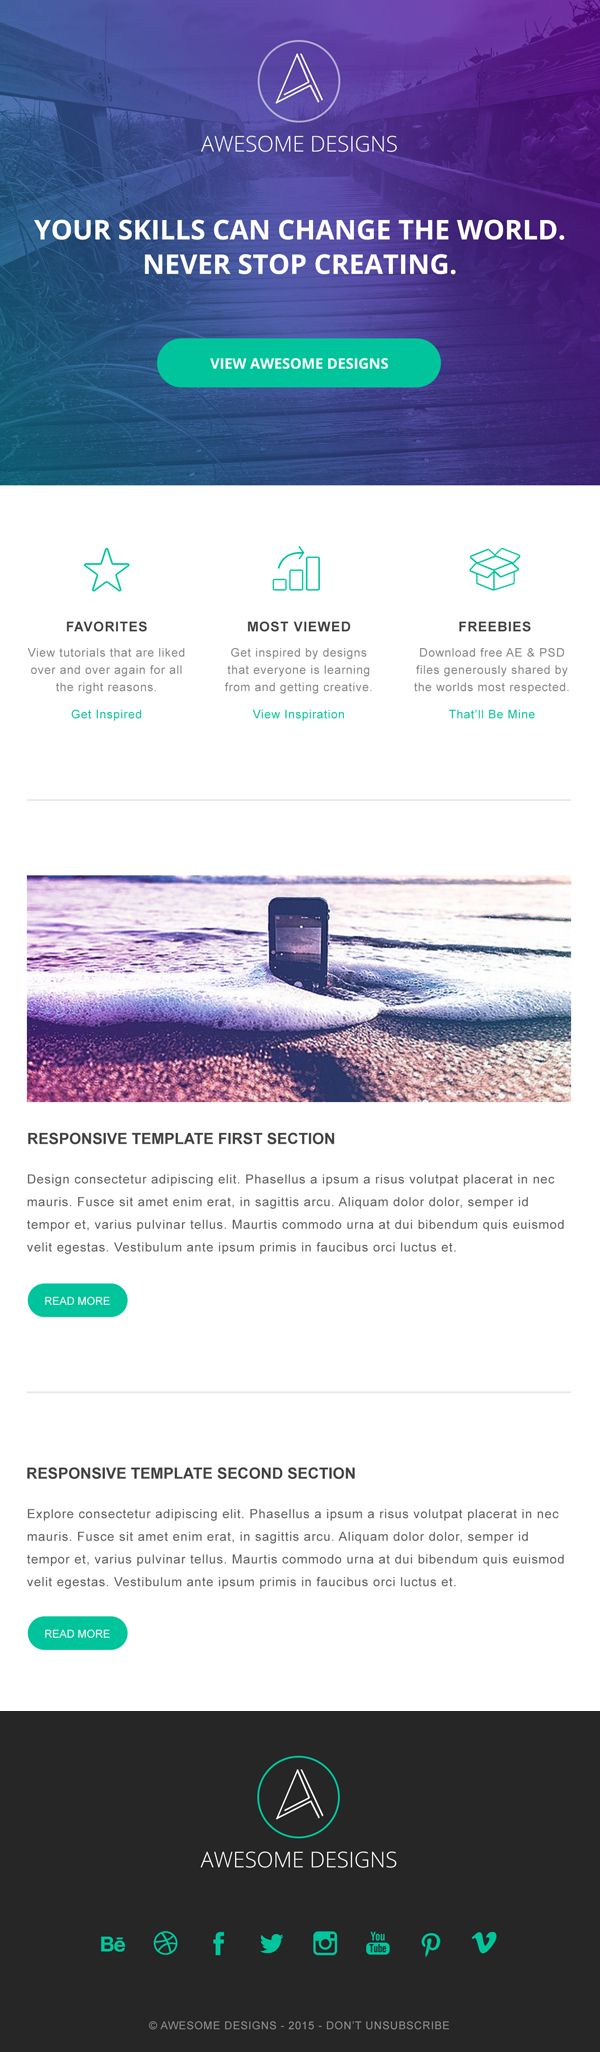 free responsive email template design psd psdtemplate webtemplate